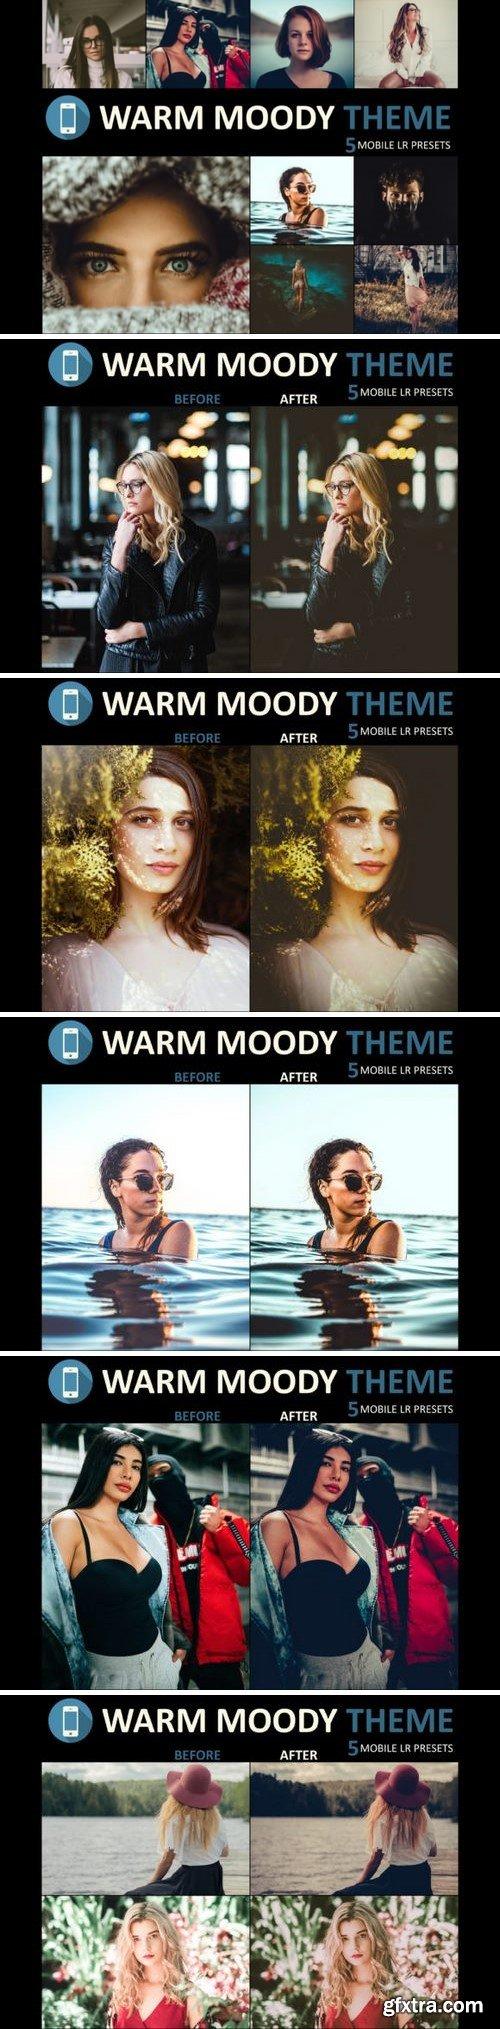 Neo Warm Moody mobile lightroom presets